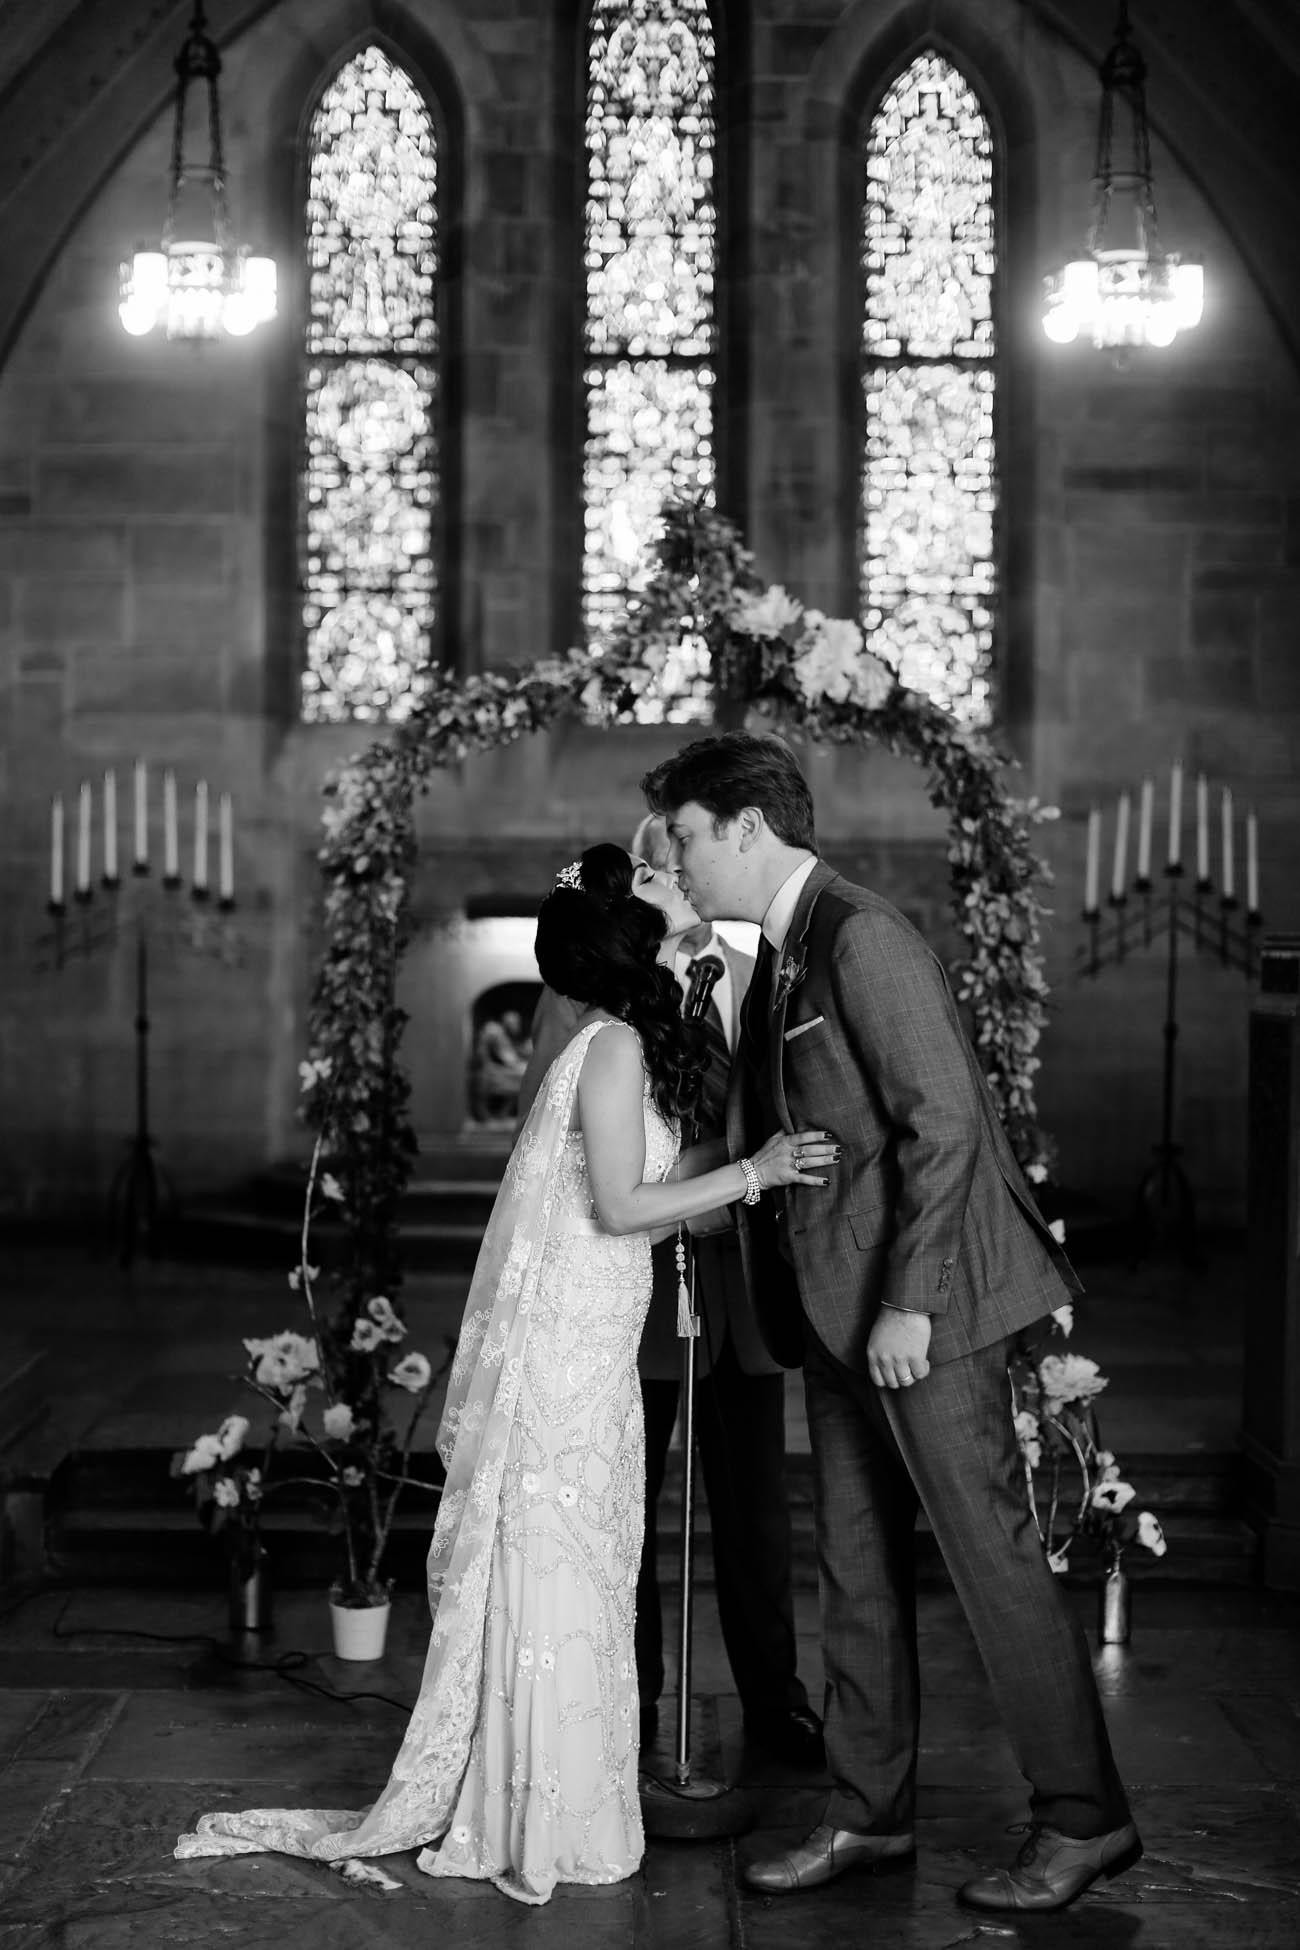 Speakeasy-1920s-theme-Louisville-and-Lexington Wedding-230.jpg